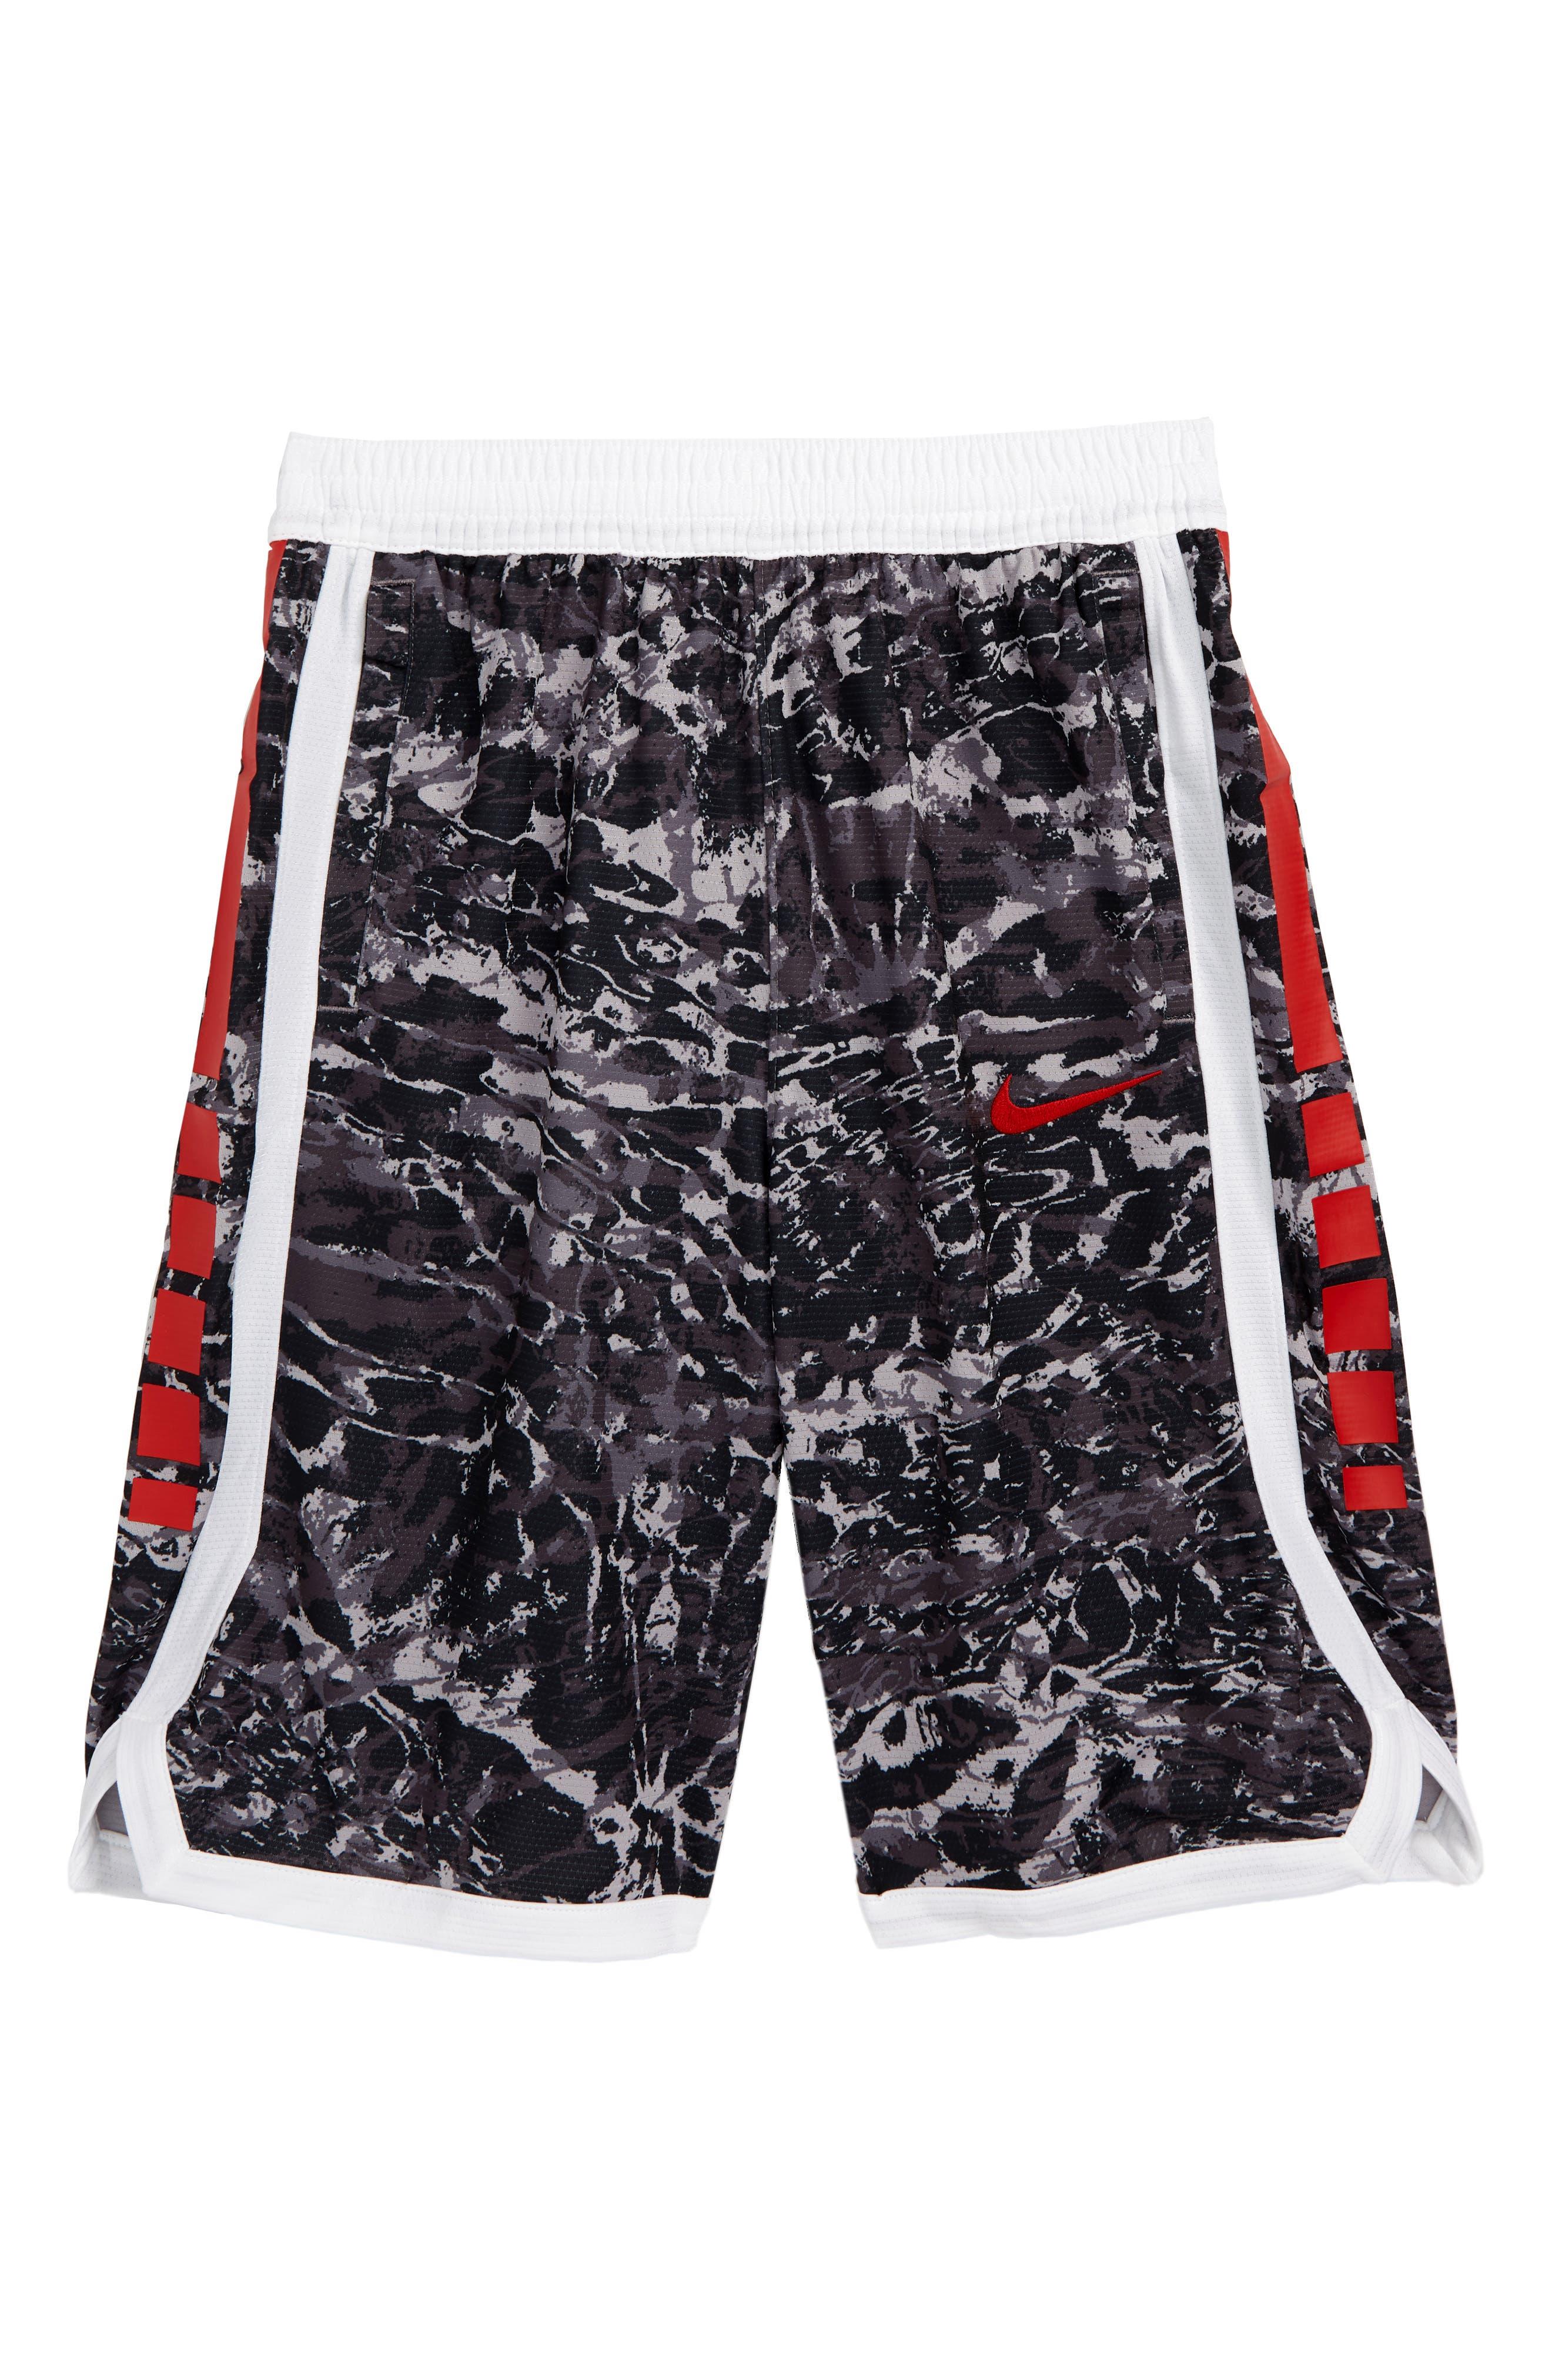 NIKE Dry Elite Basketball Shorts, Main, color, GUNSMOKE/ WHITE/ UNIV RED